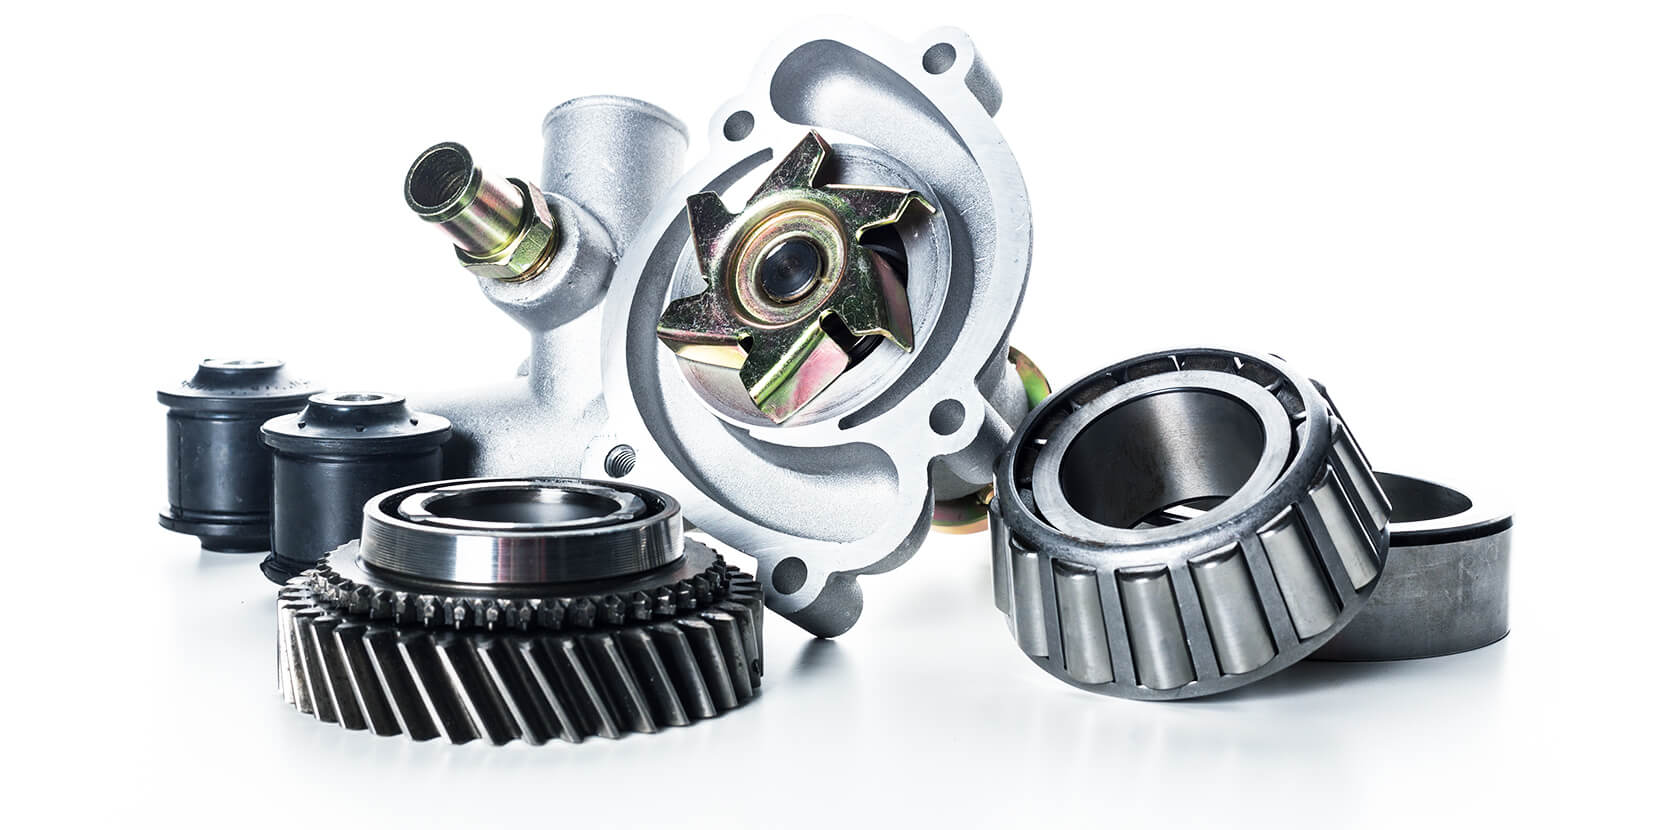 KFZ-Technik-Dominic-Bucher-Ersatzteile